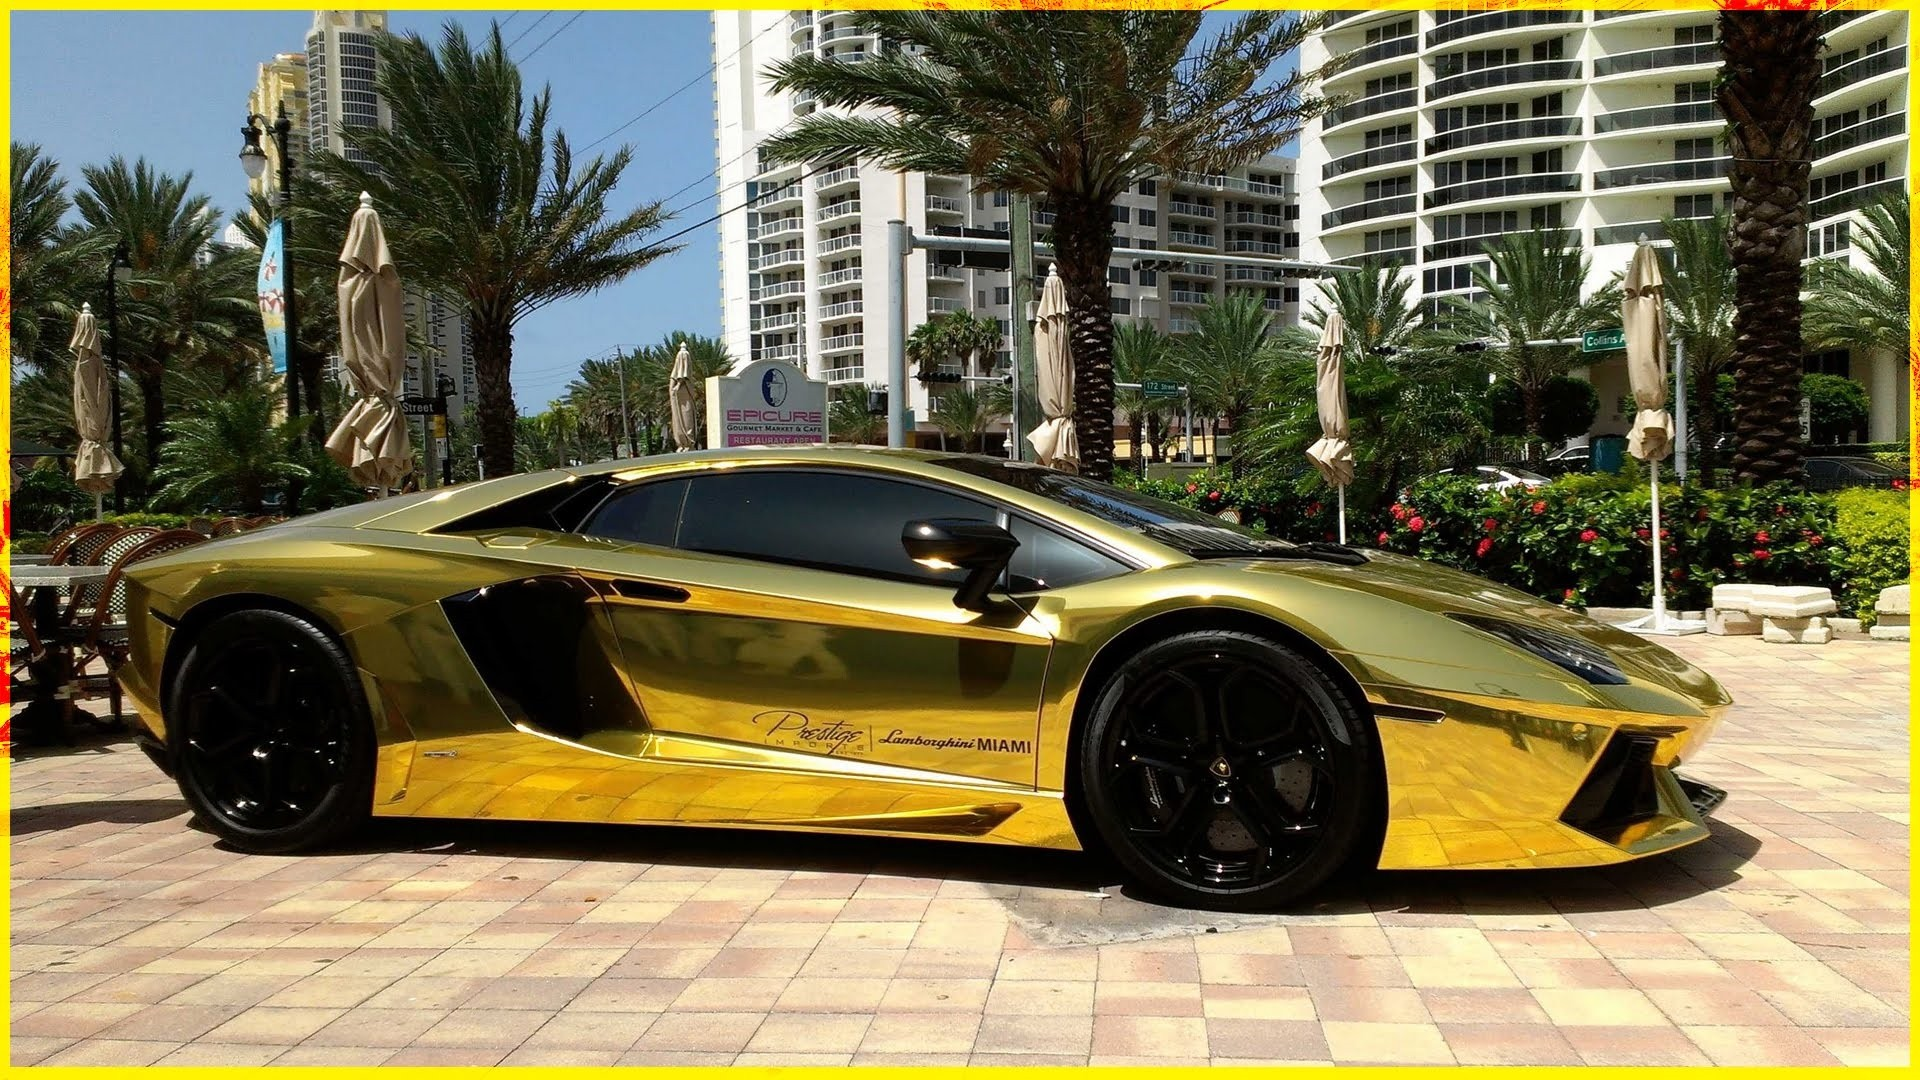 Gold Lamborghini wallpaper